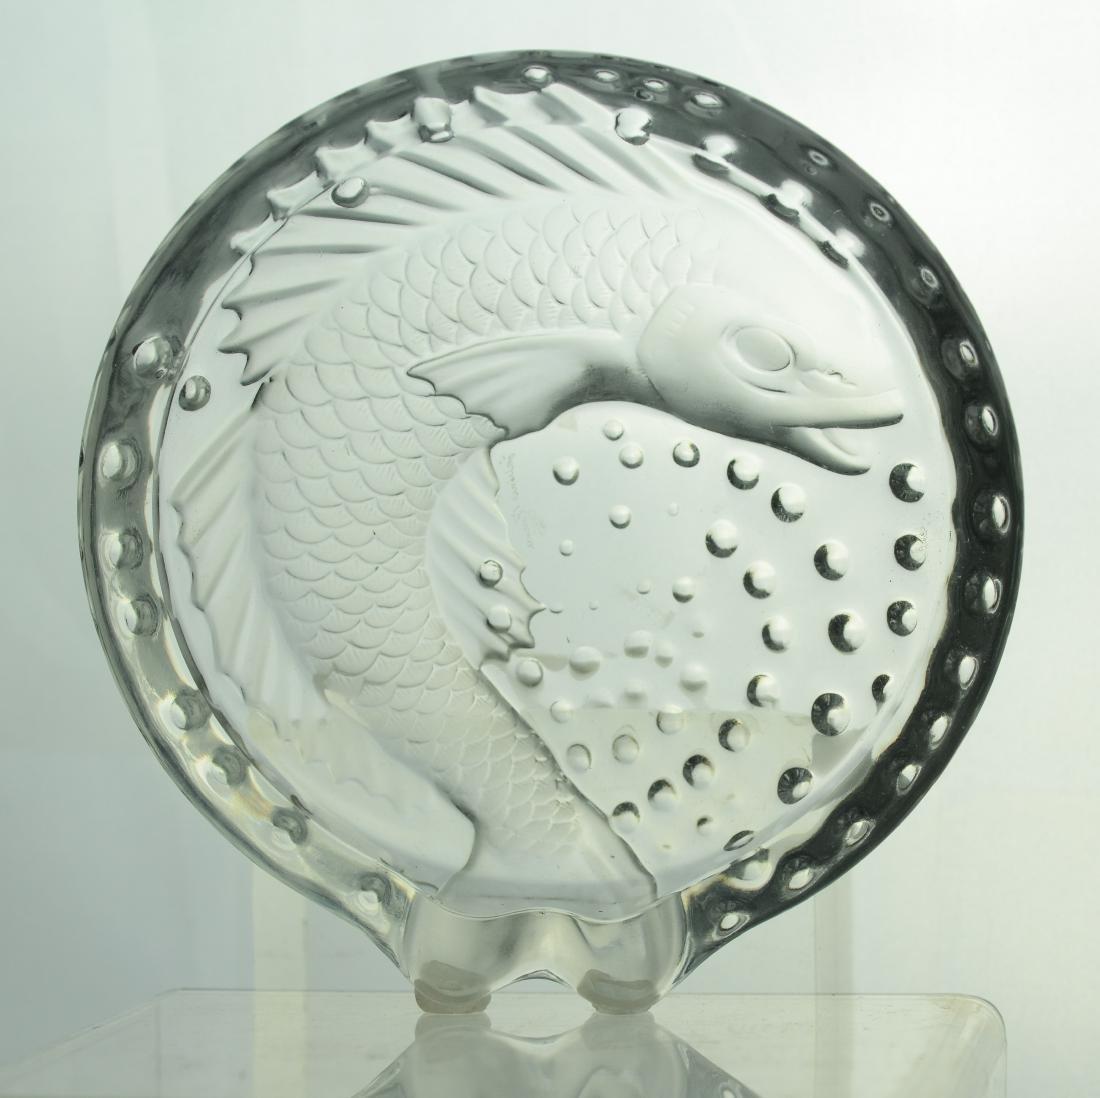 Lalique France Concarneau koi fish cigar ashtray - 3